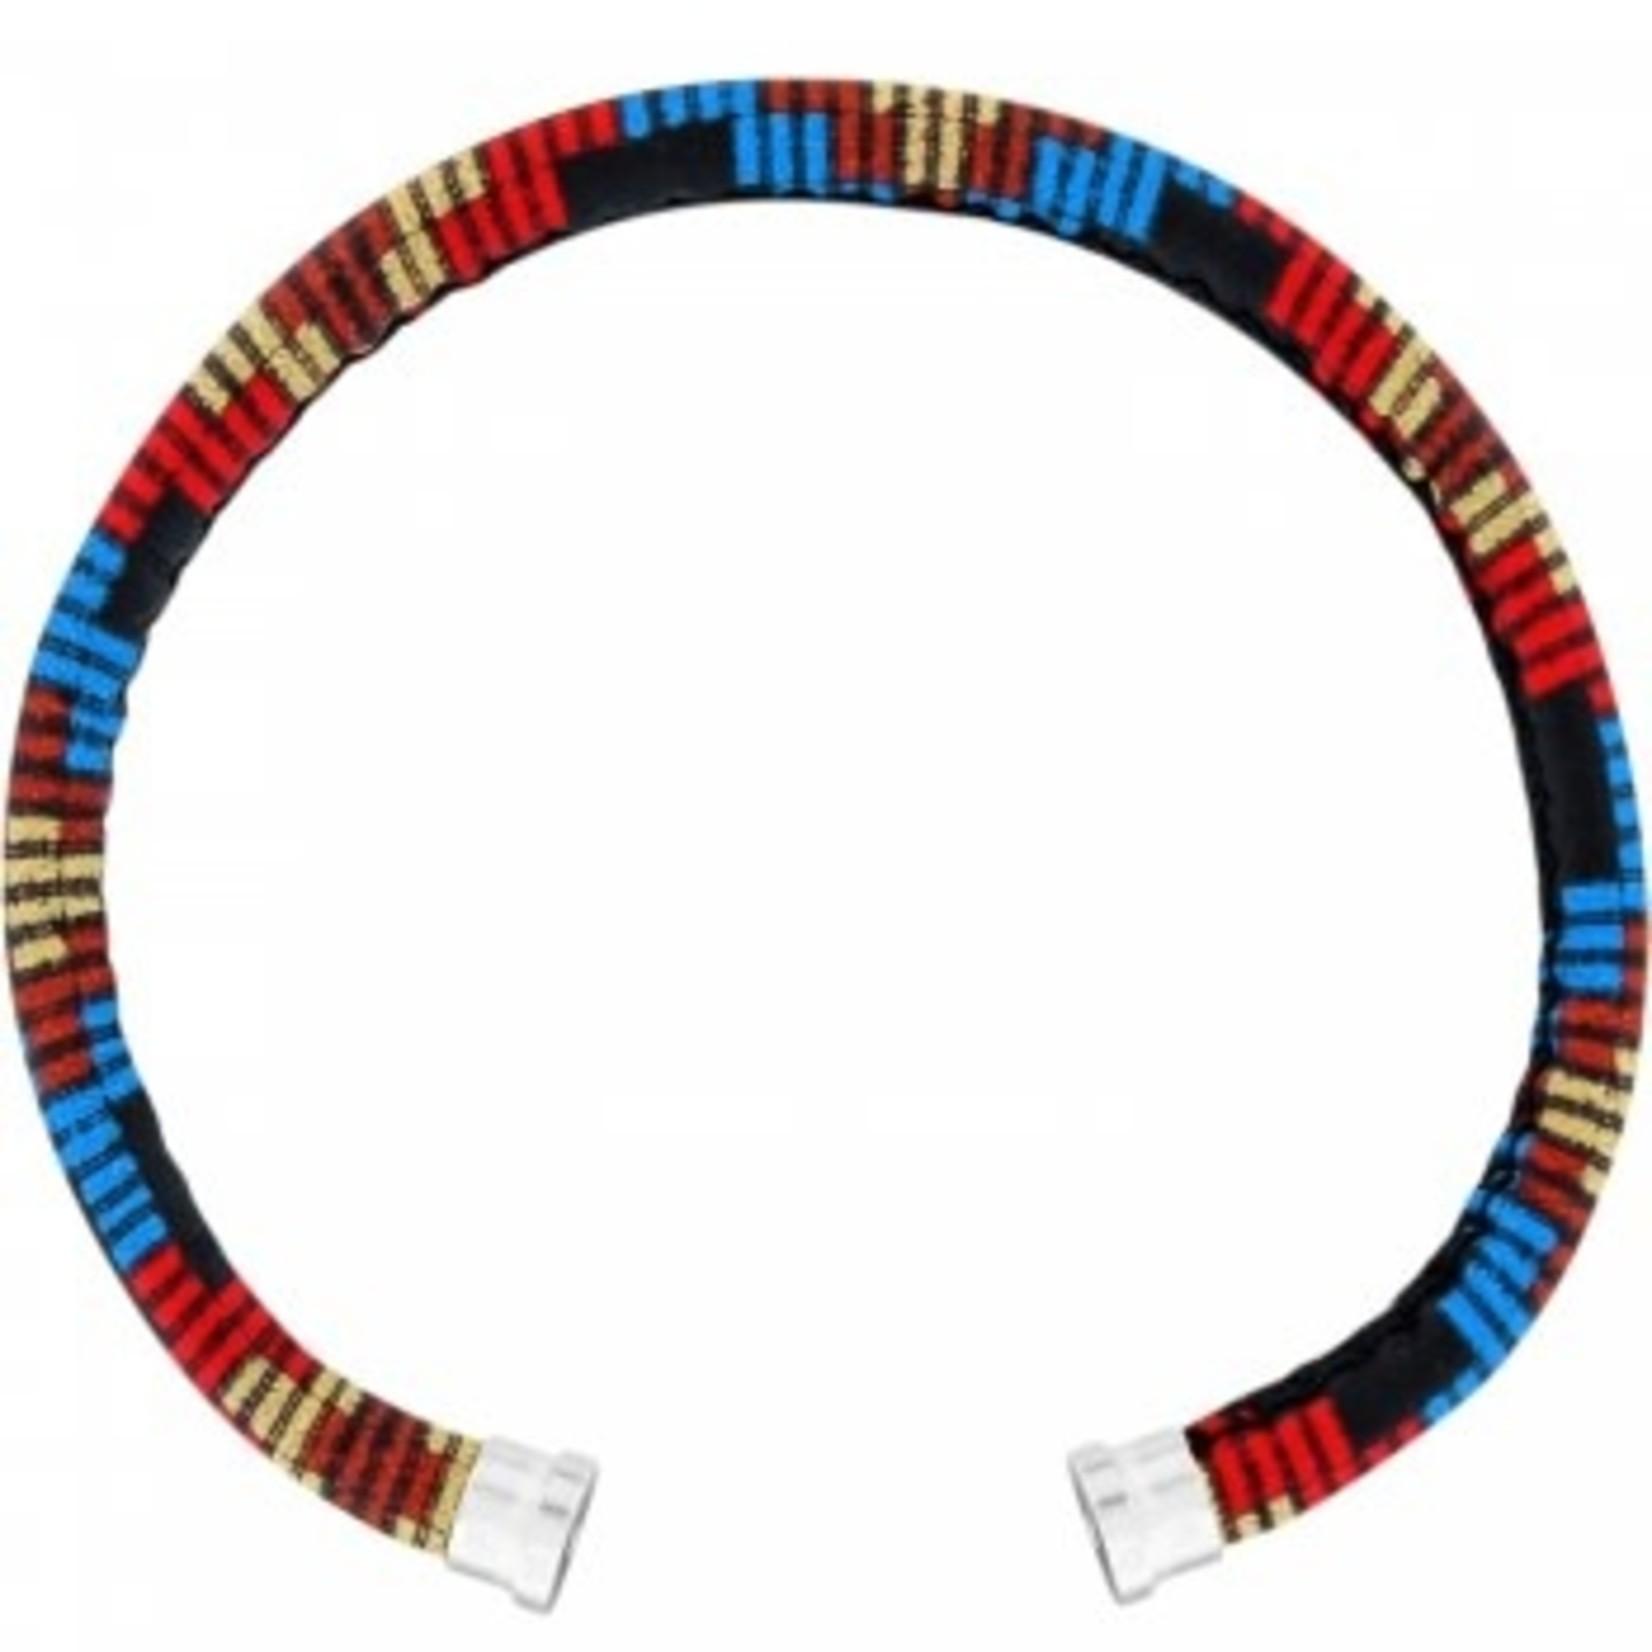 Brighton Color Clique Leather Cord in Africa S/M